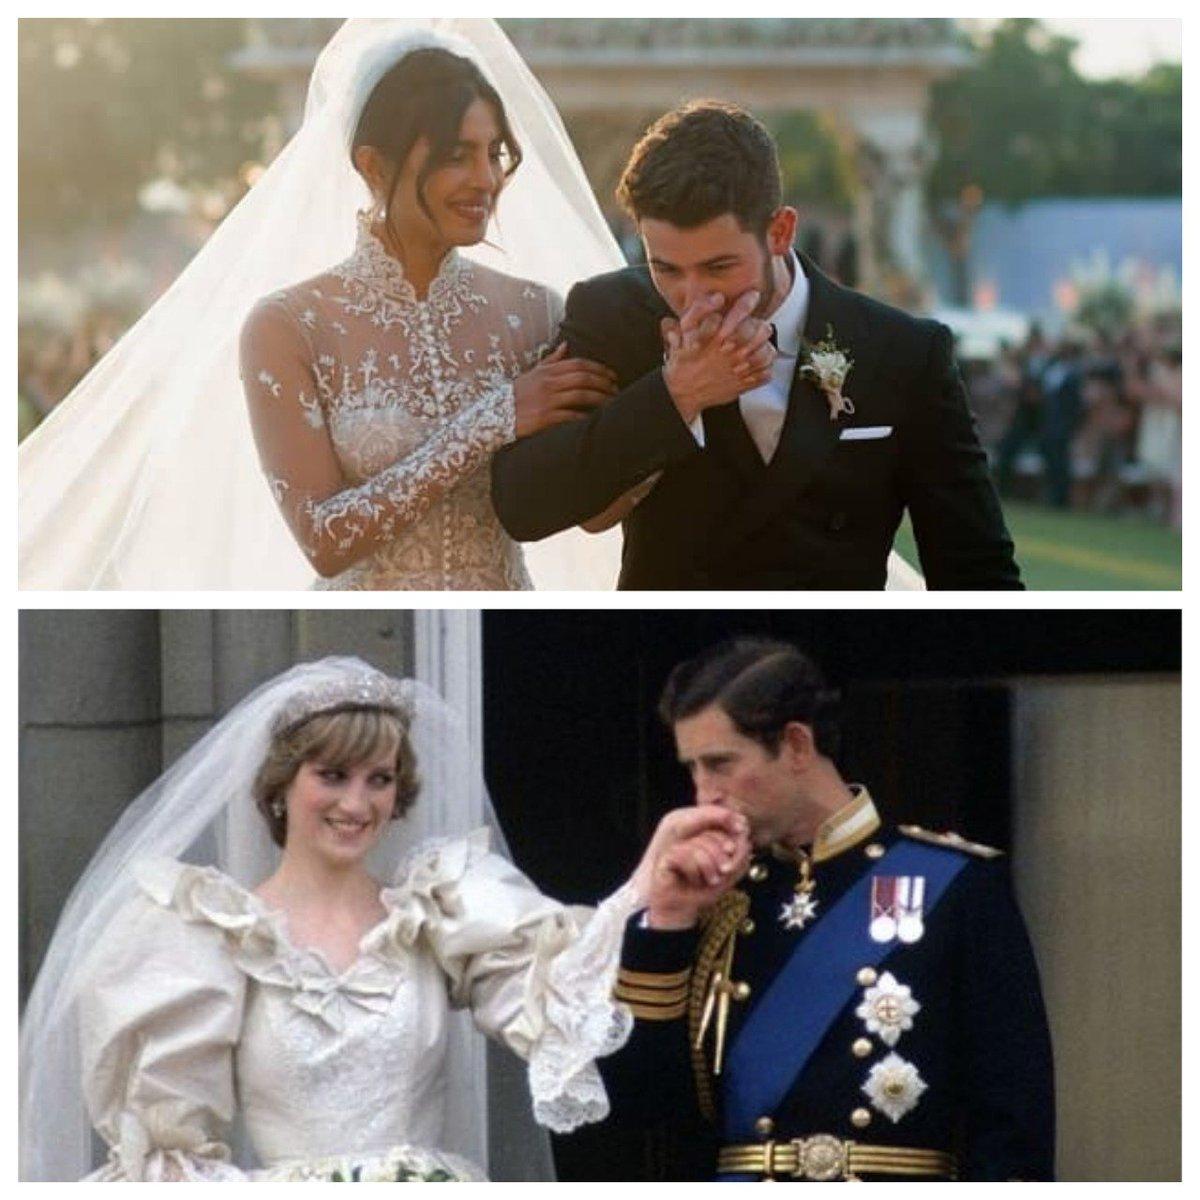 Pinkvilla On Twitter Priyanka Chopra Nick Jonas Wedding Peecee S Wedding Gown Train Reminds Us Of Princess Diana Https T Co 3exikoyo7l Priyankachopra Nickjonas Princessdiana Priyankanickwedding Https T Co Ln6vkzvsyu